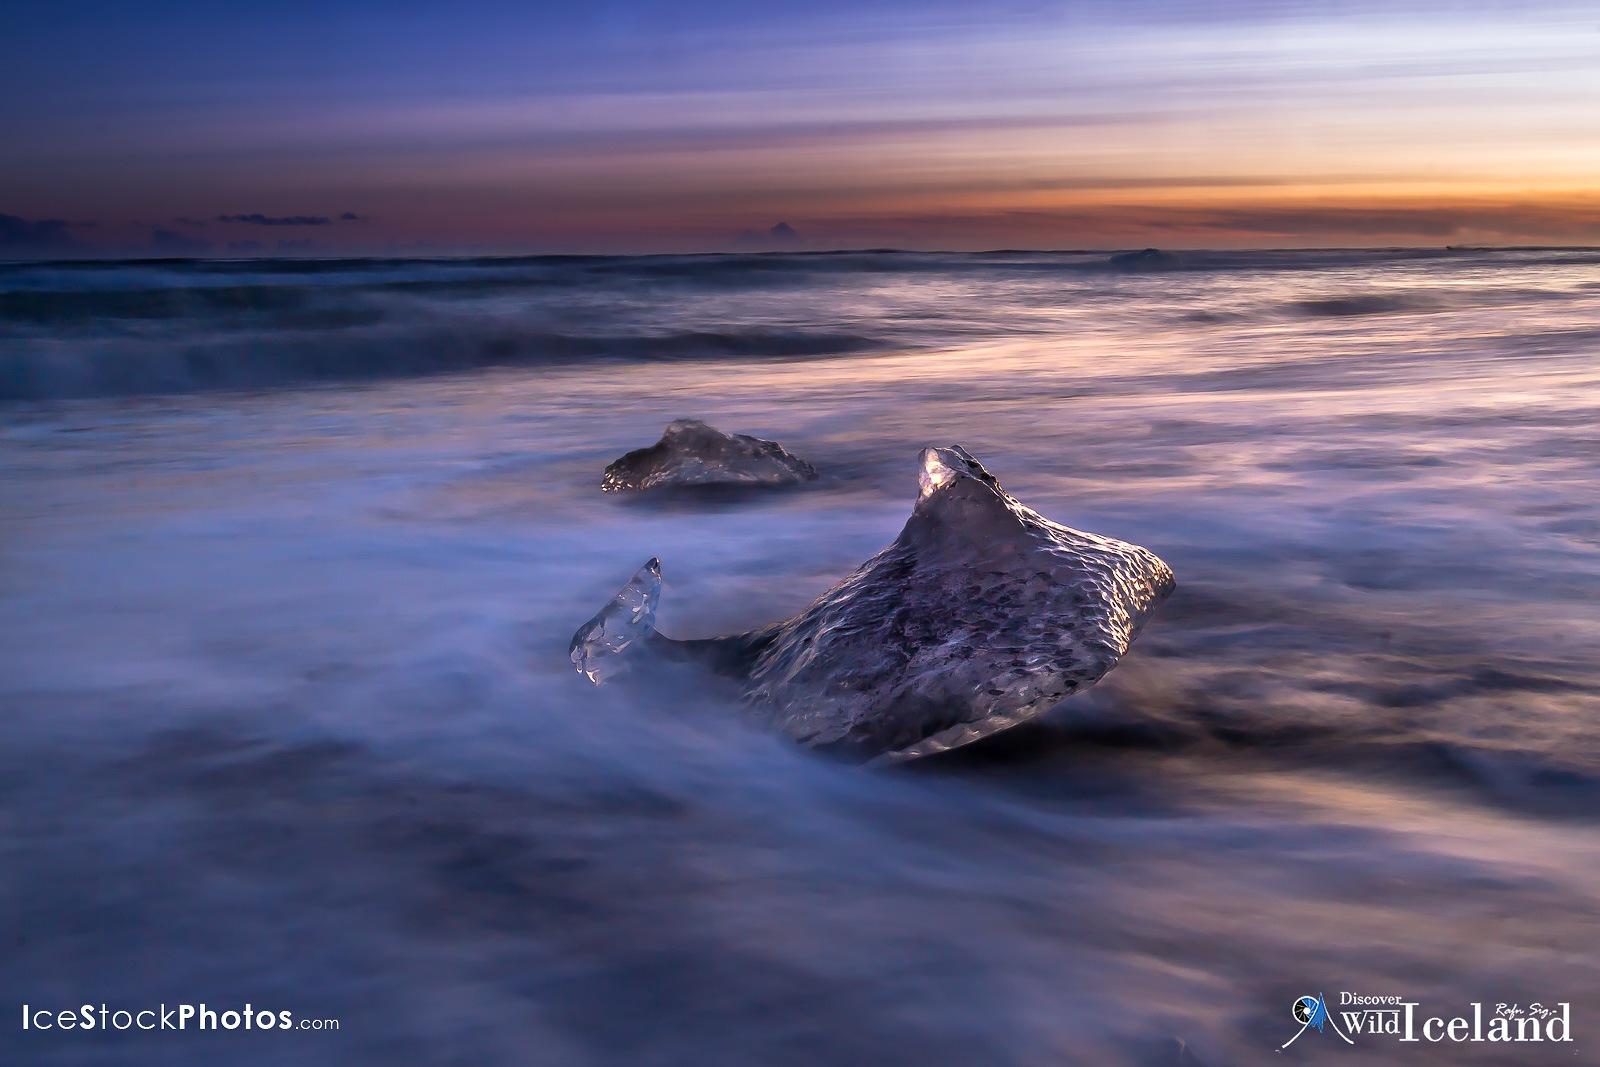 Diamond Black Beach - Jökulsárlón - #Iceland by Rafn Sig,-  @ Discover Wild Iceland.com